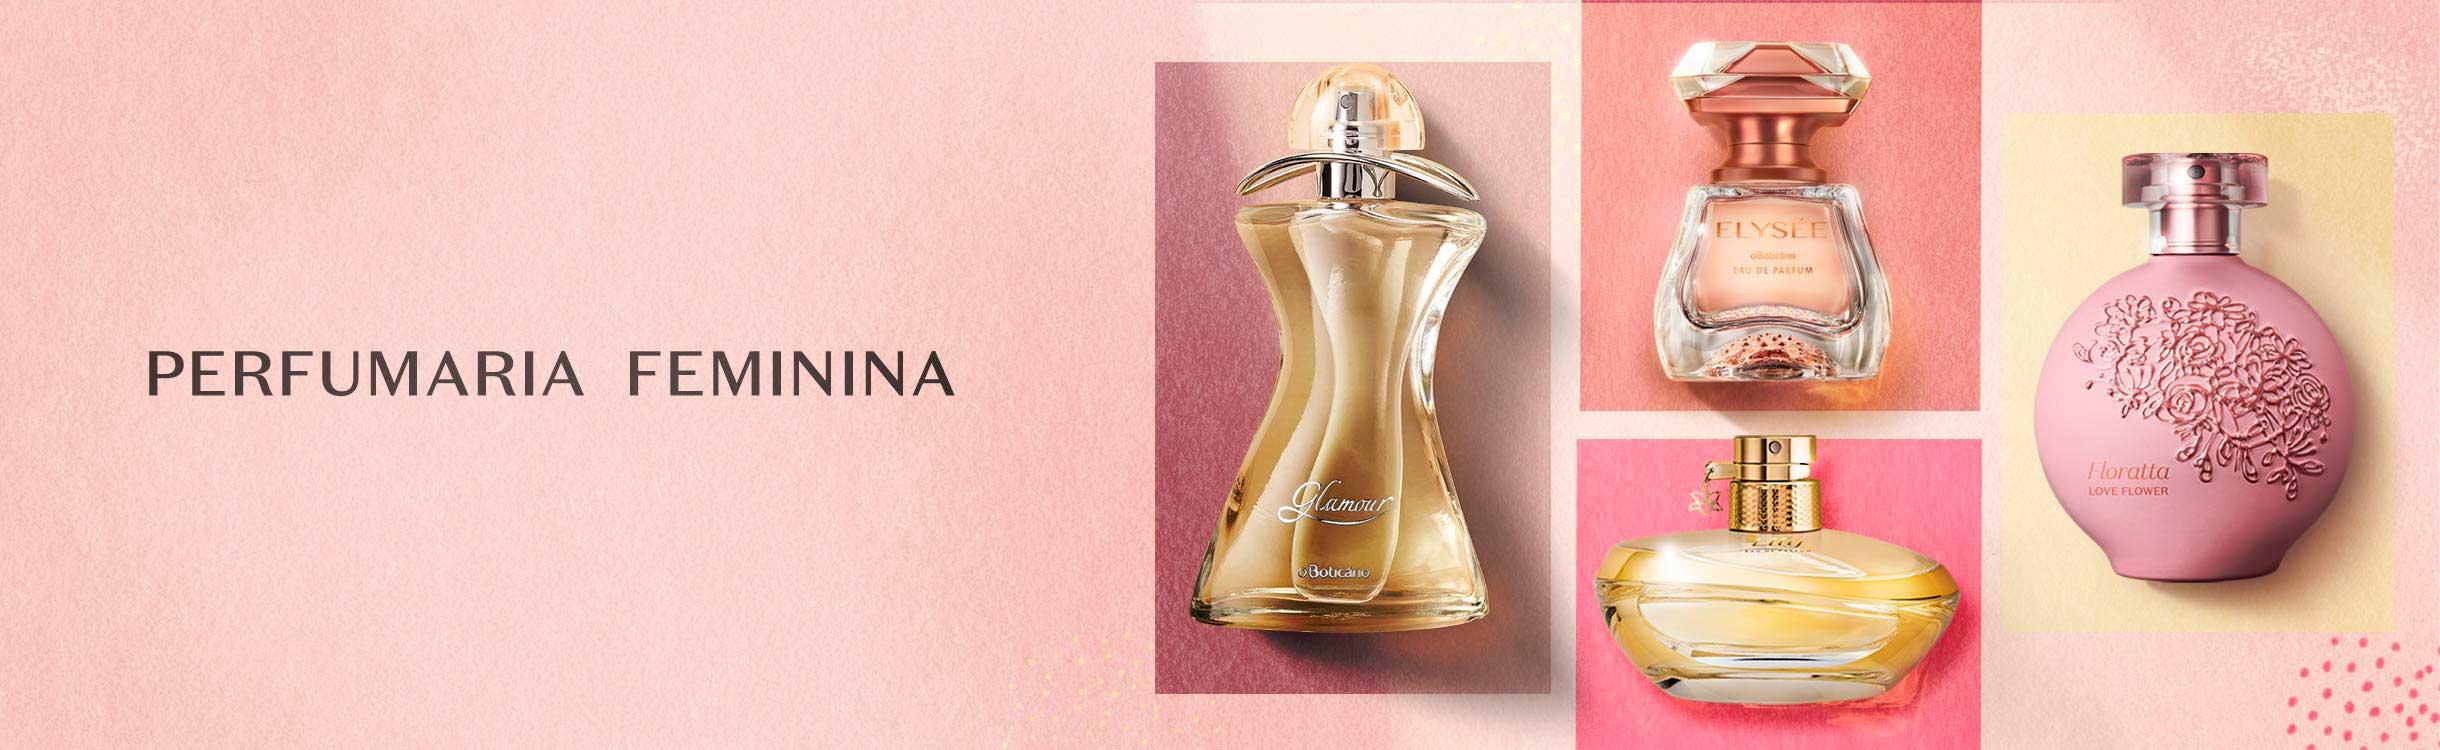 Perfumaria o Boticário Feminina